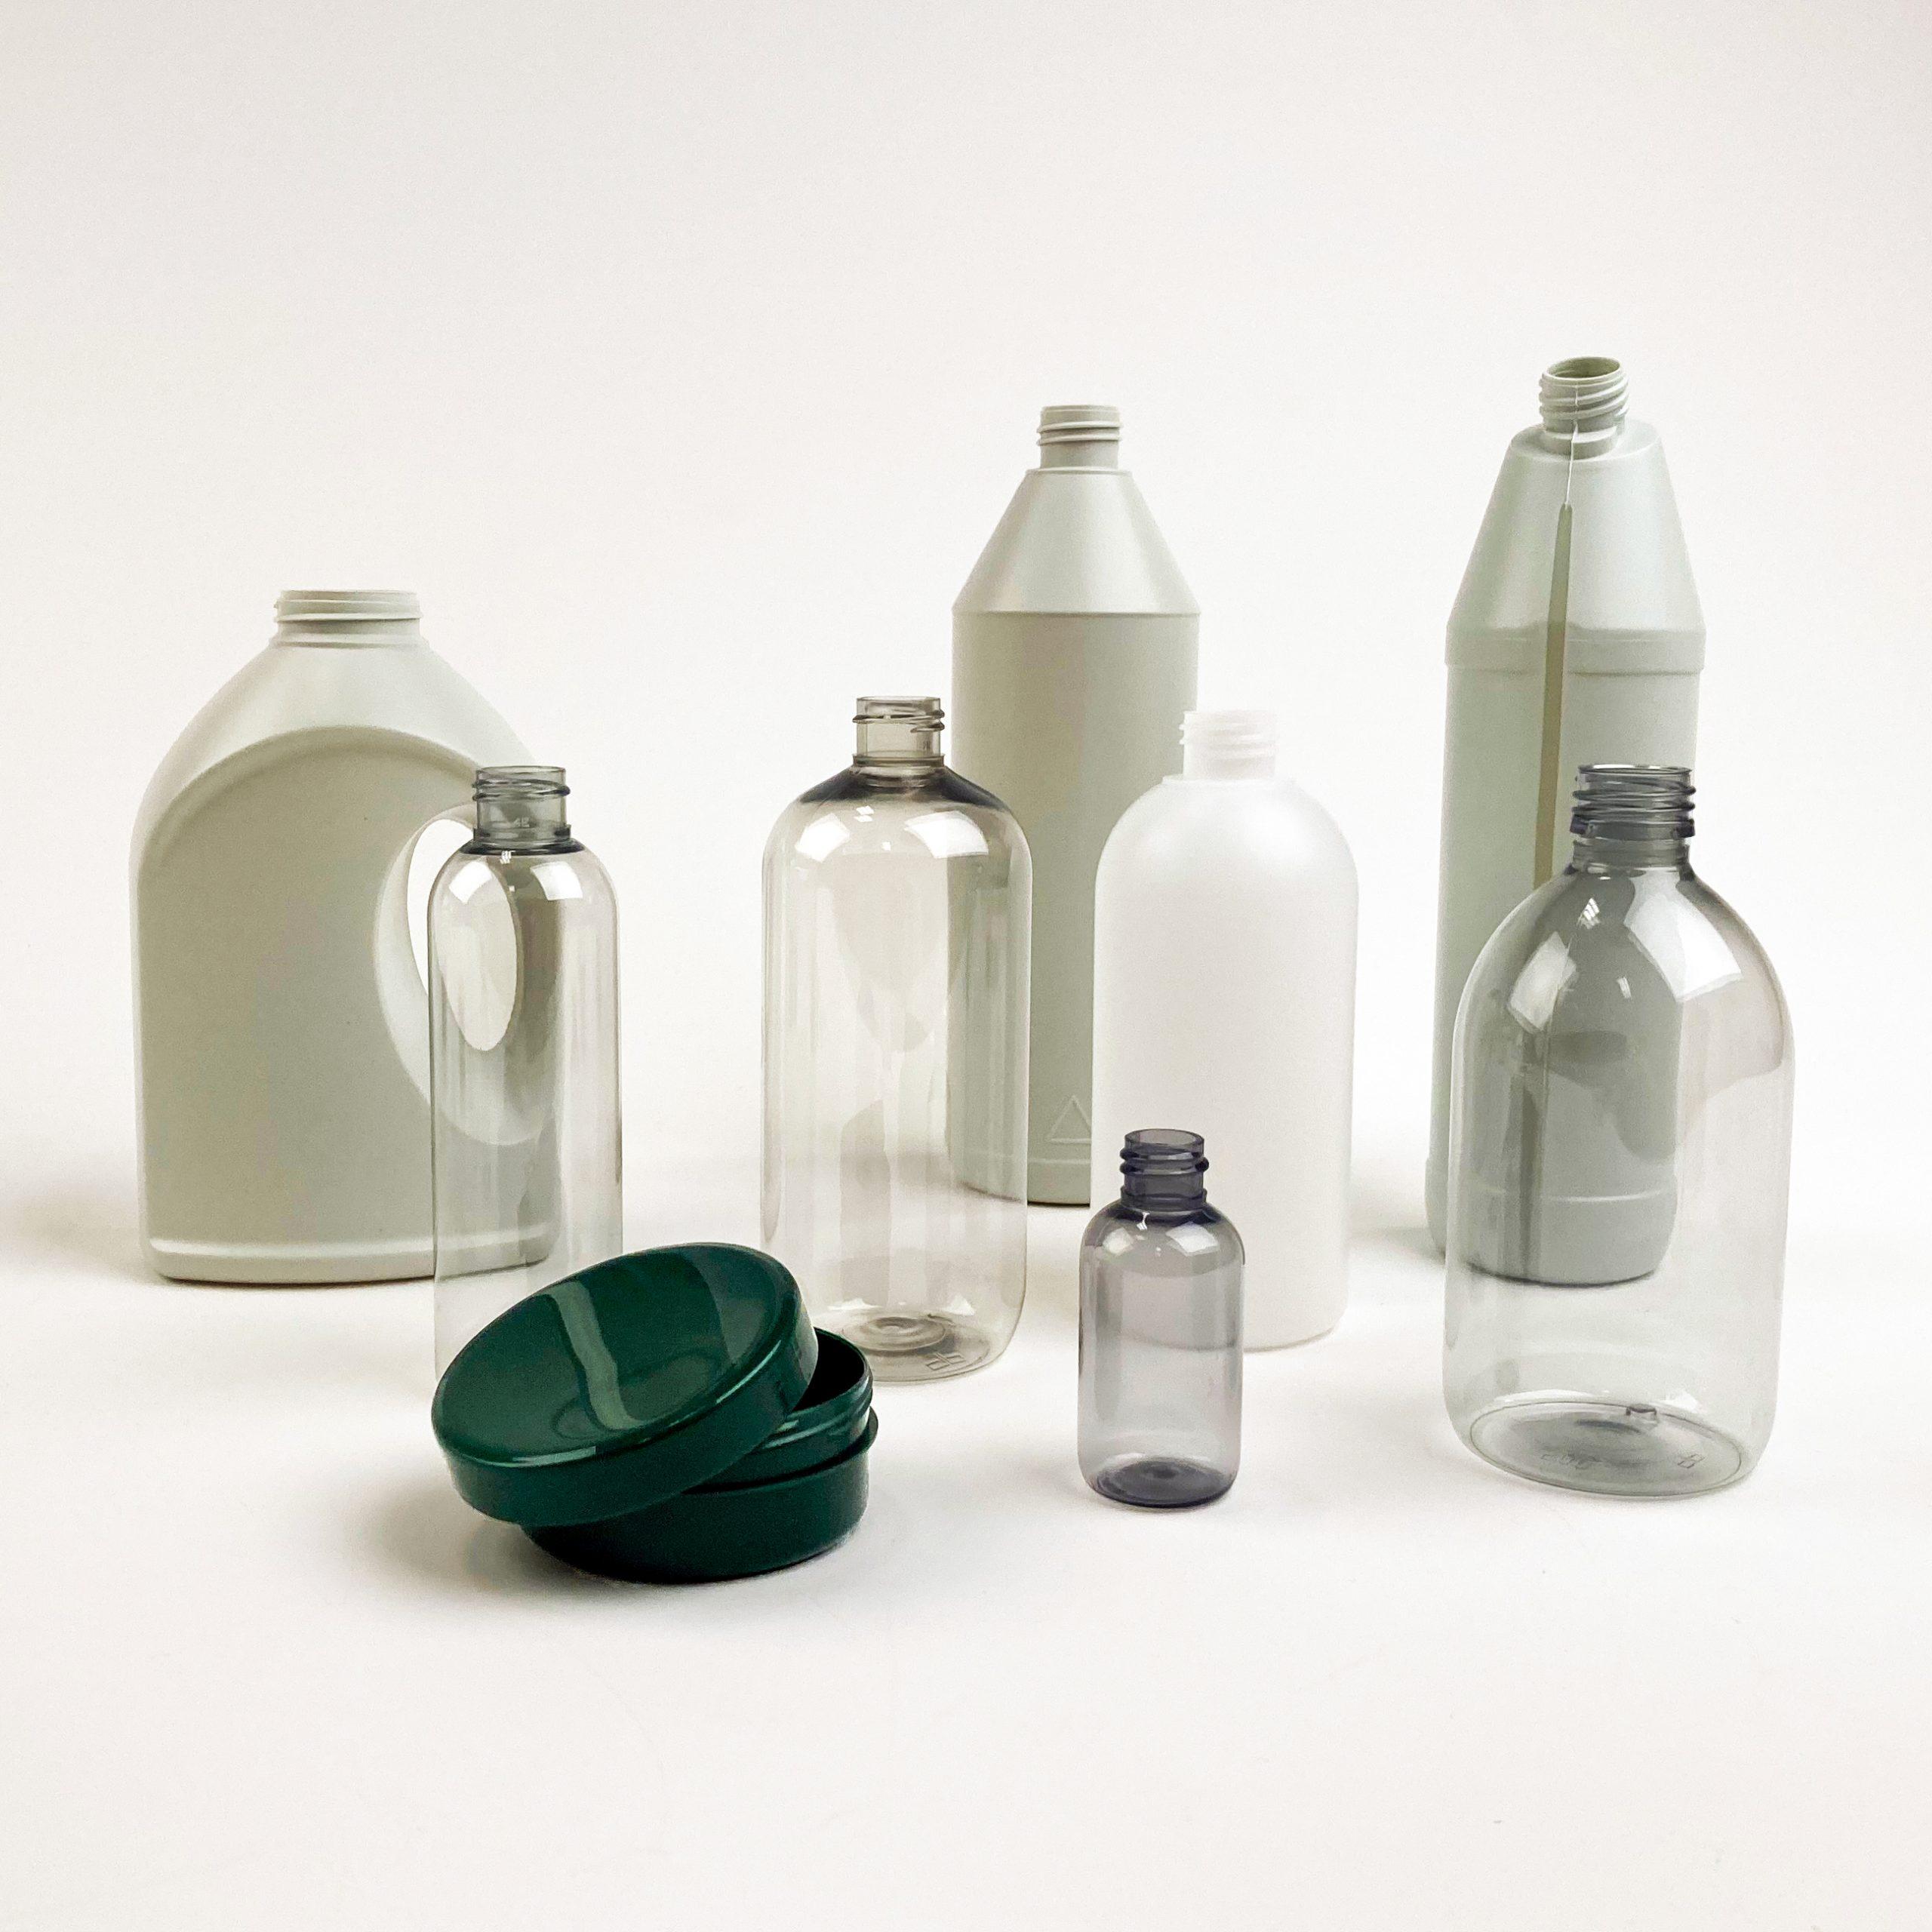 Bæredygtig emballage